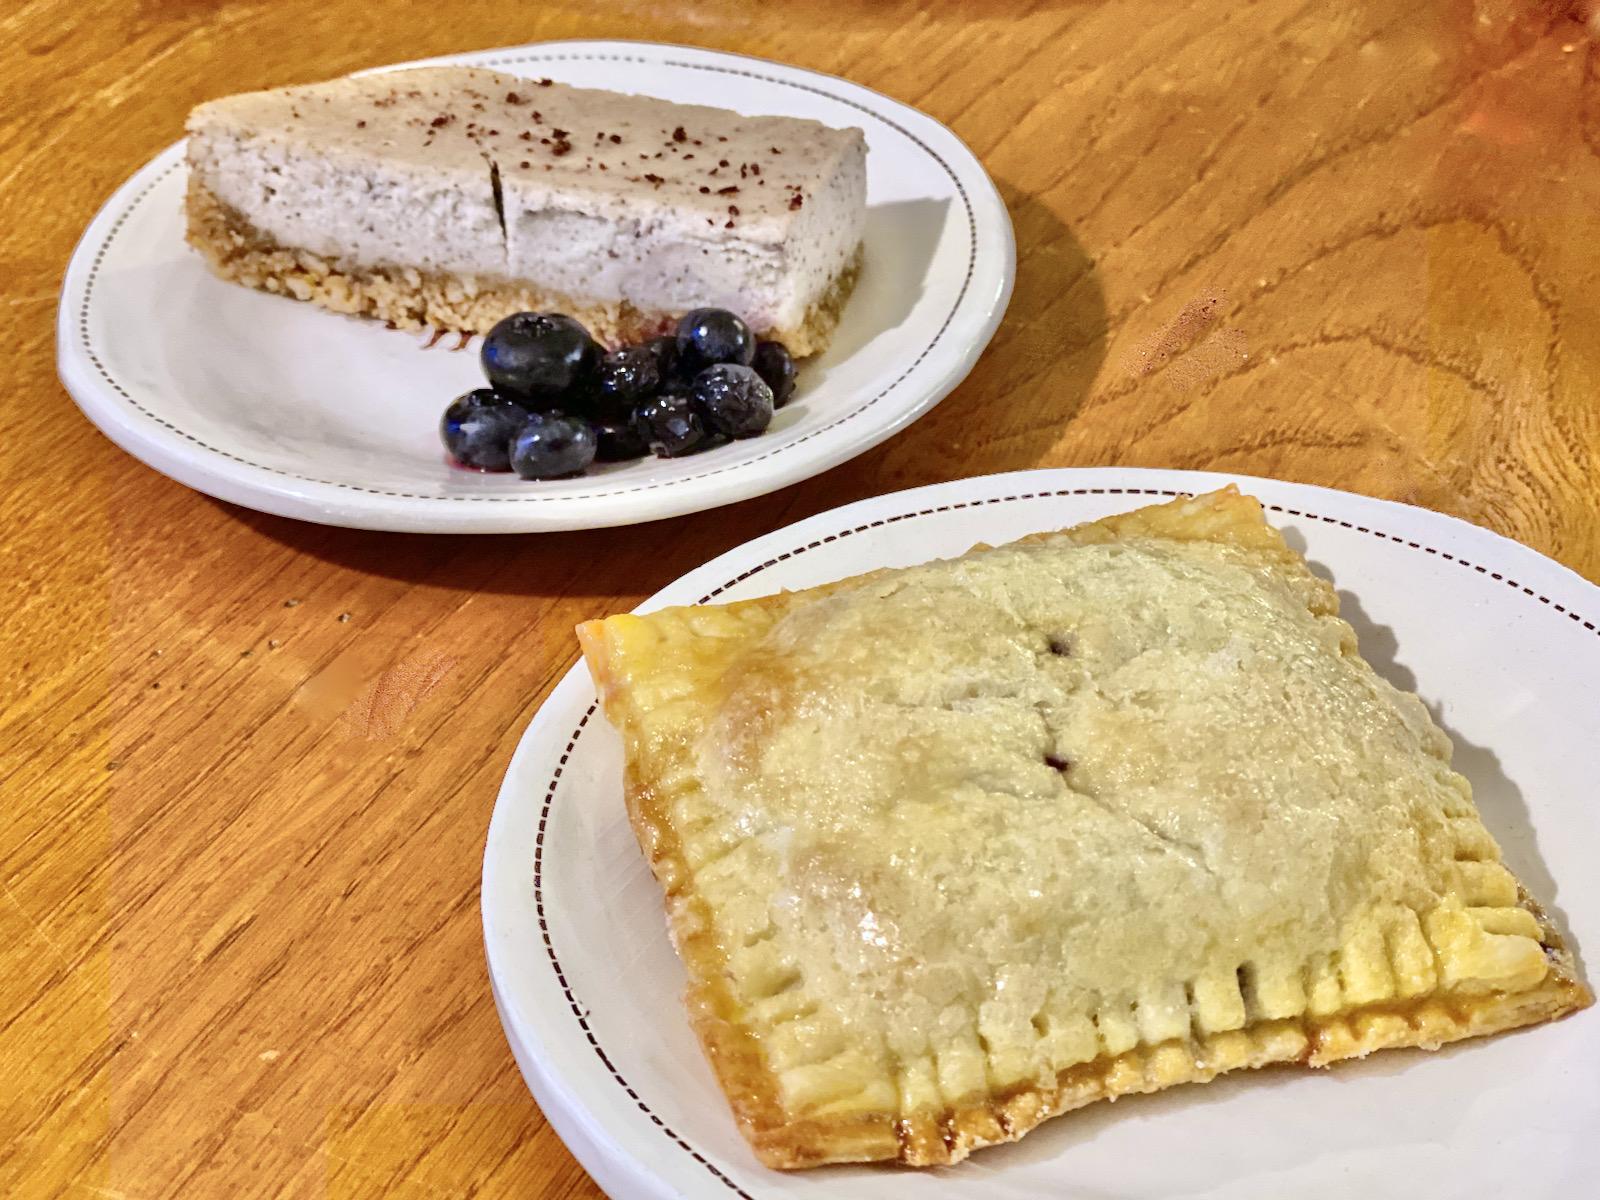 Goodkind sumac lemon bar and blueberry hand pie